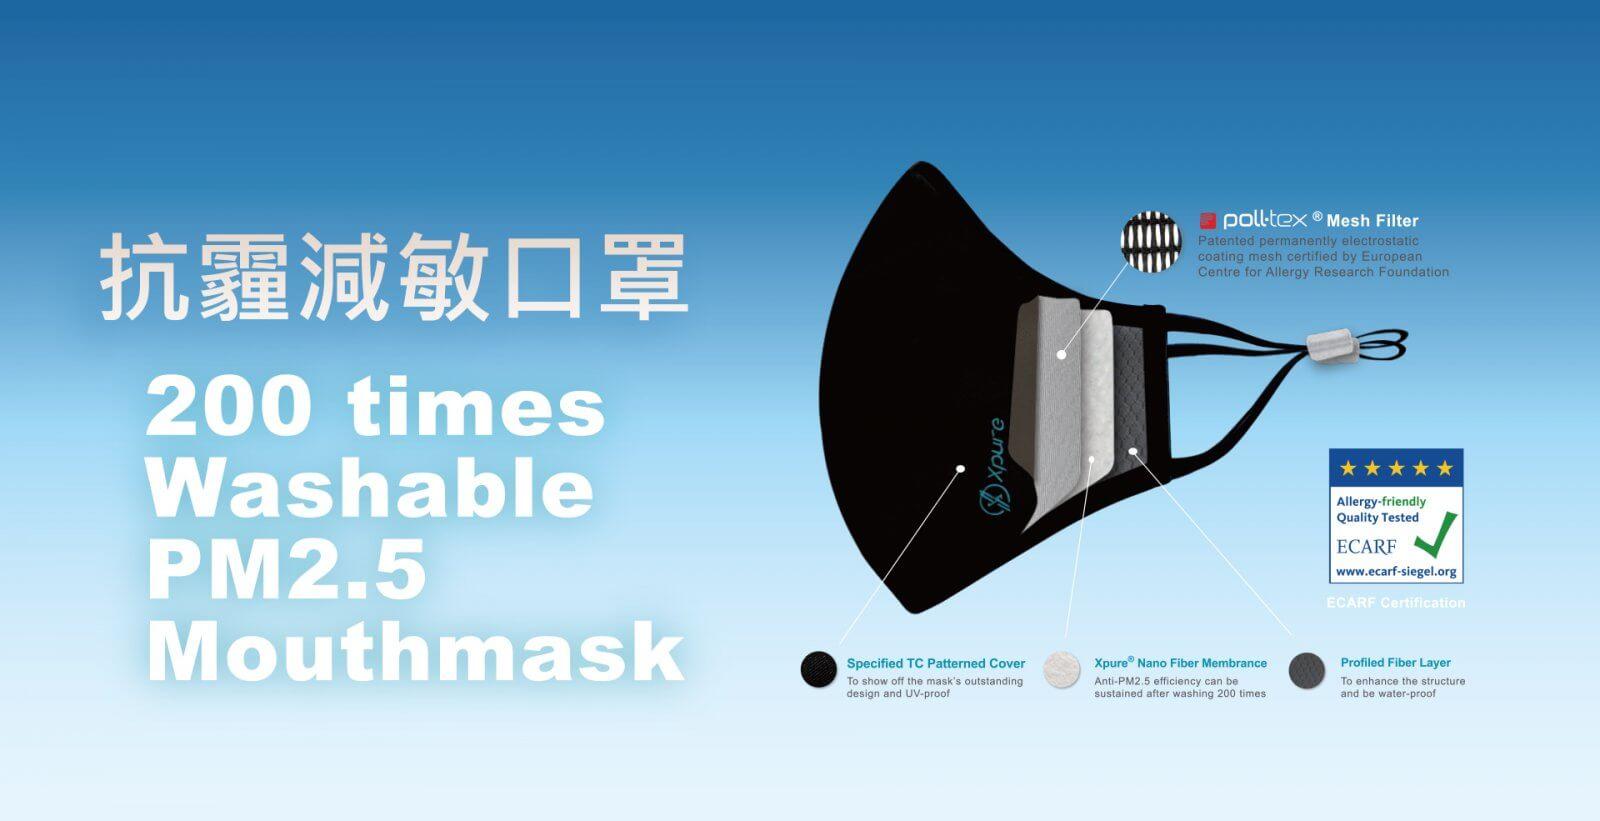 poll-tex抗霾減敏口罩可阻隔PM2.5